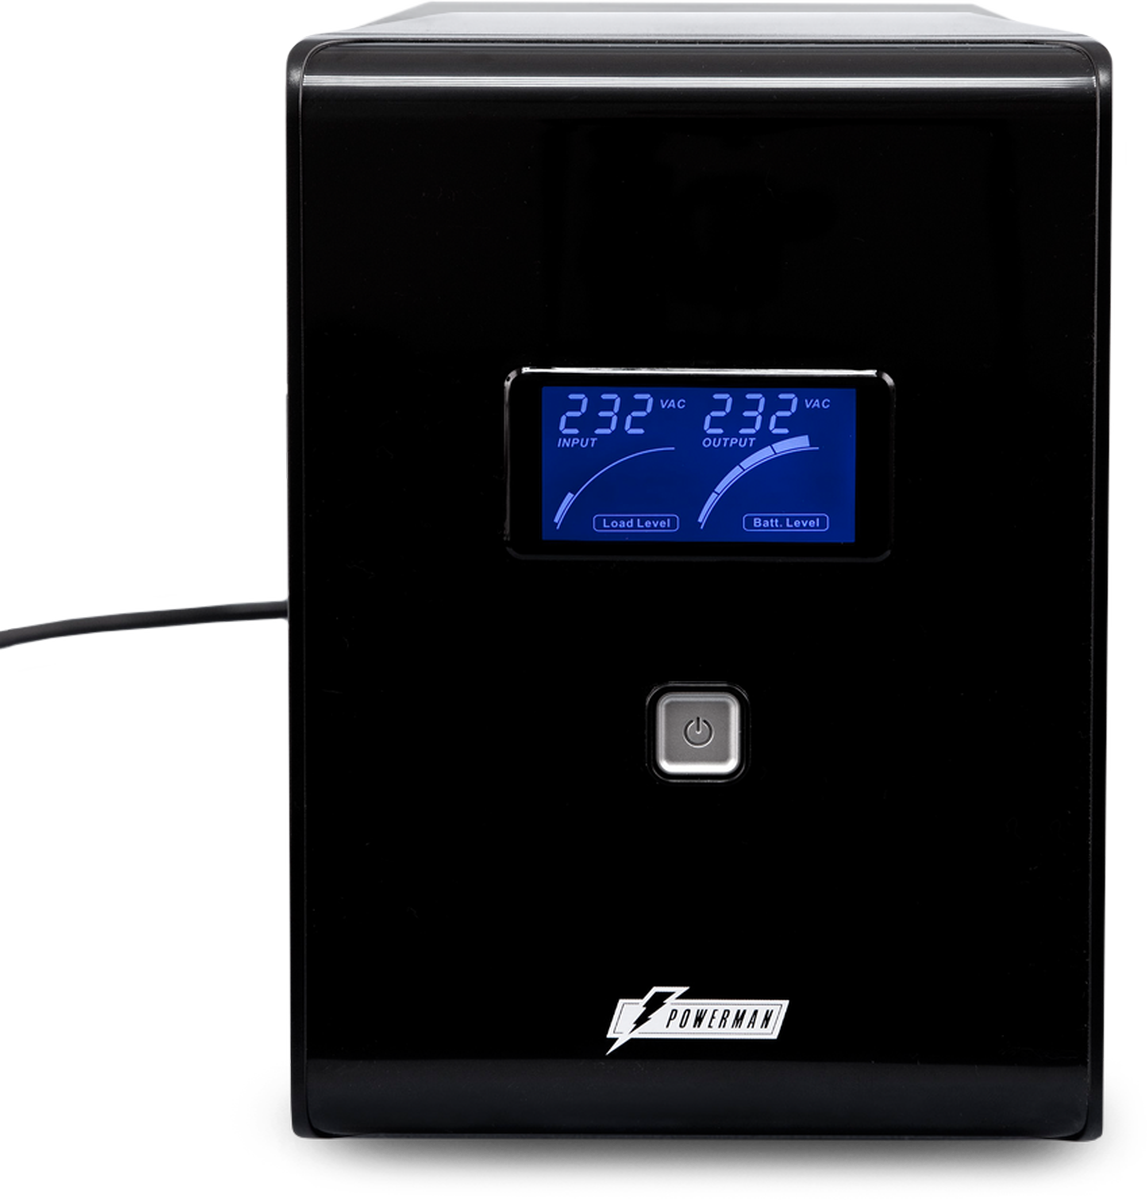 Источник бесперебойного питания Powerman UPS Smart Sine 2000, 2000 ВА источник бесперебойного питания ippon back power pro lcd 600